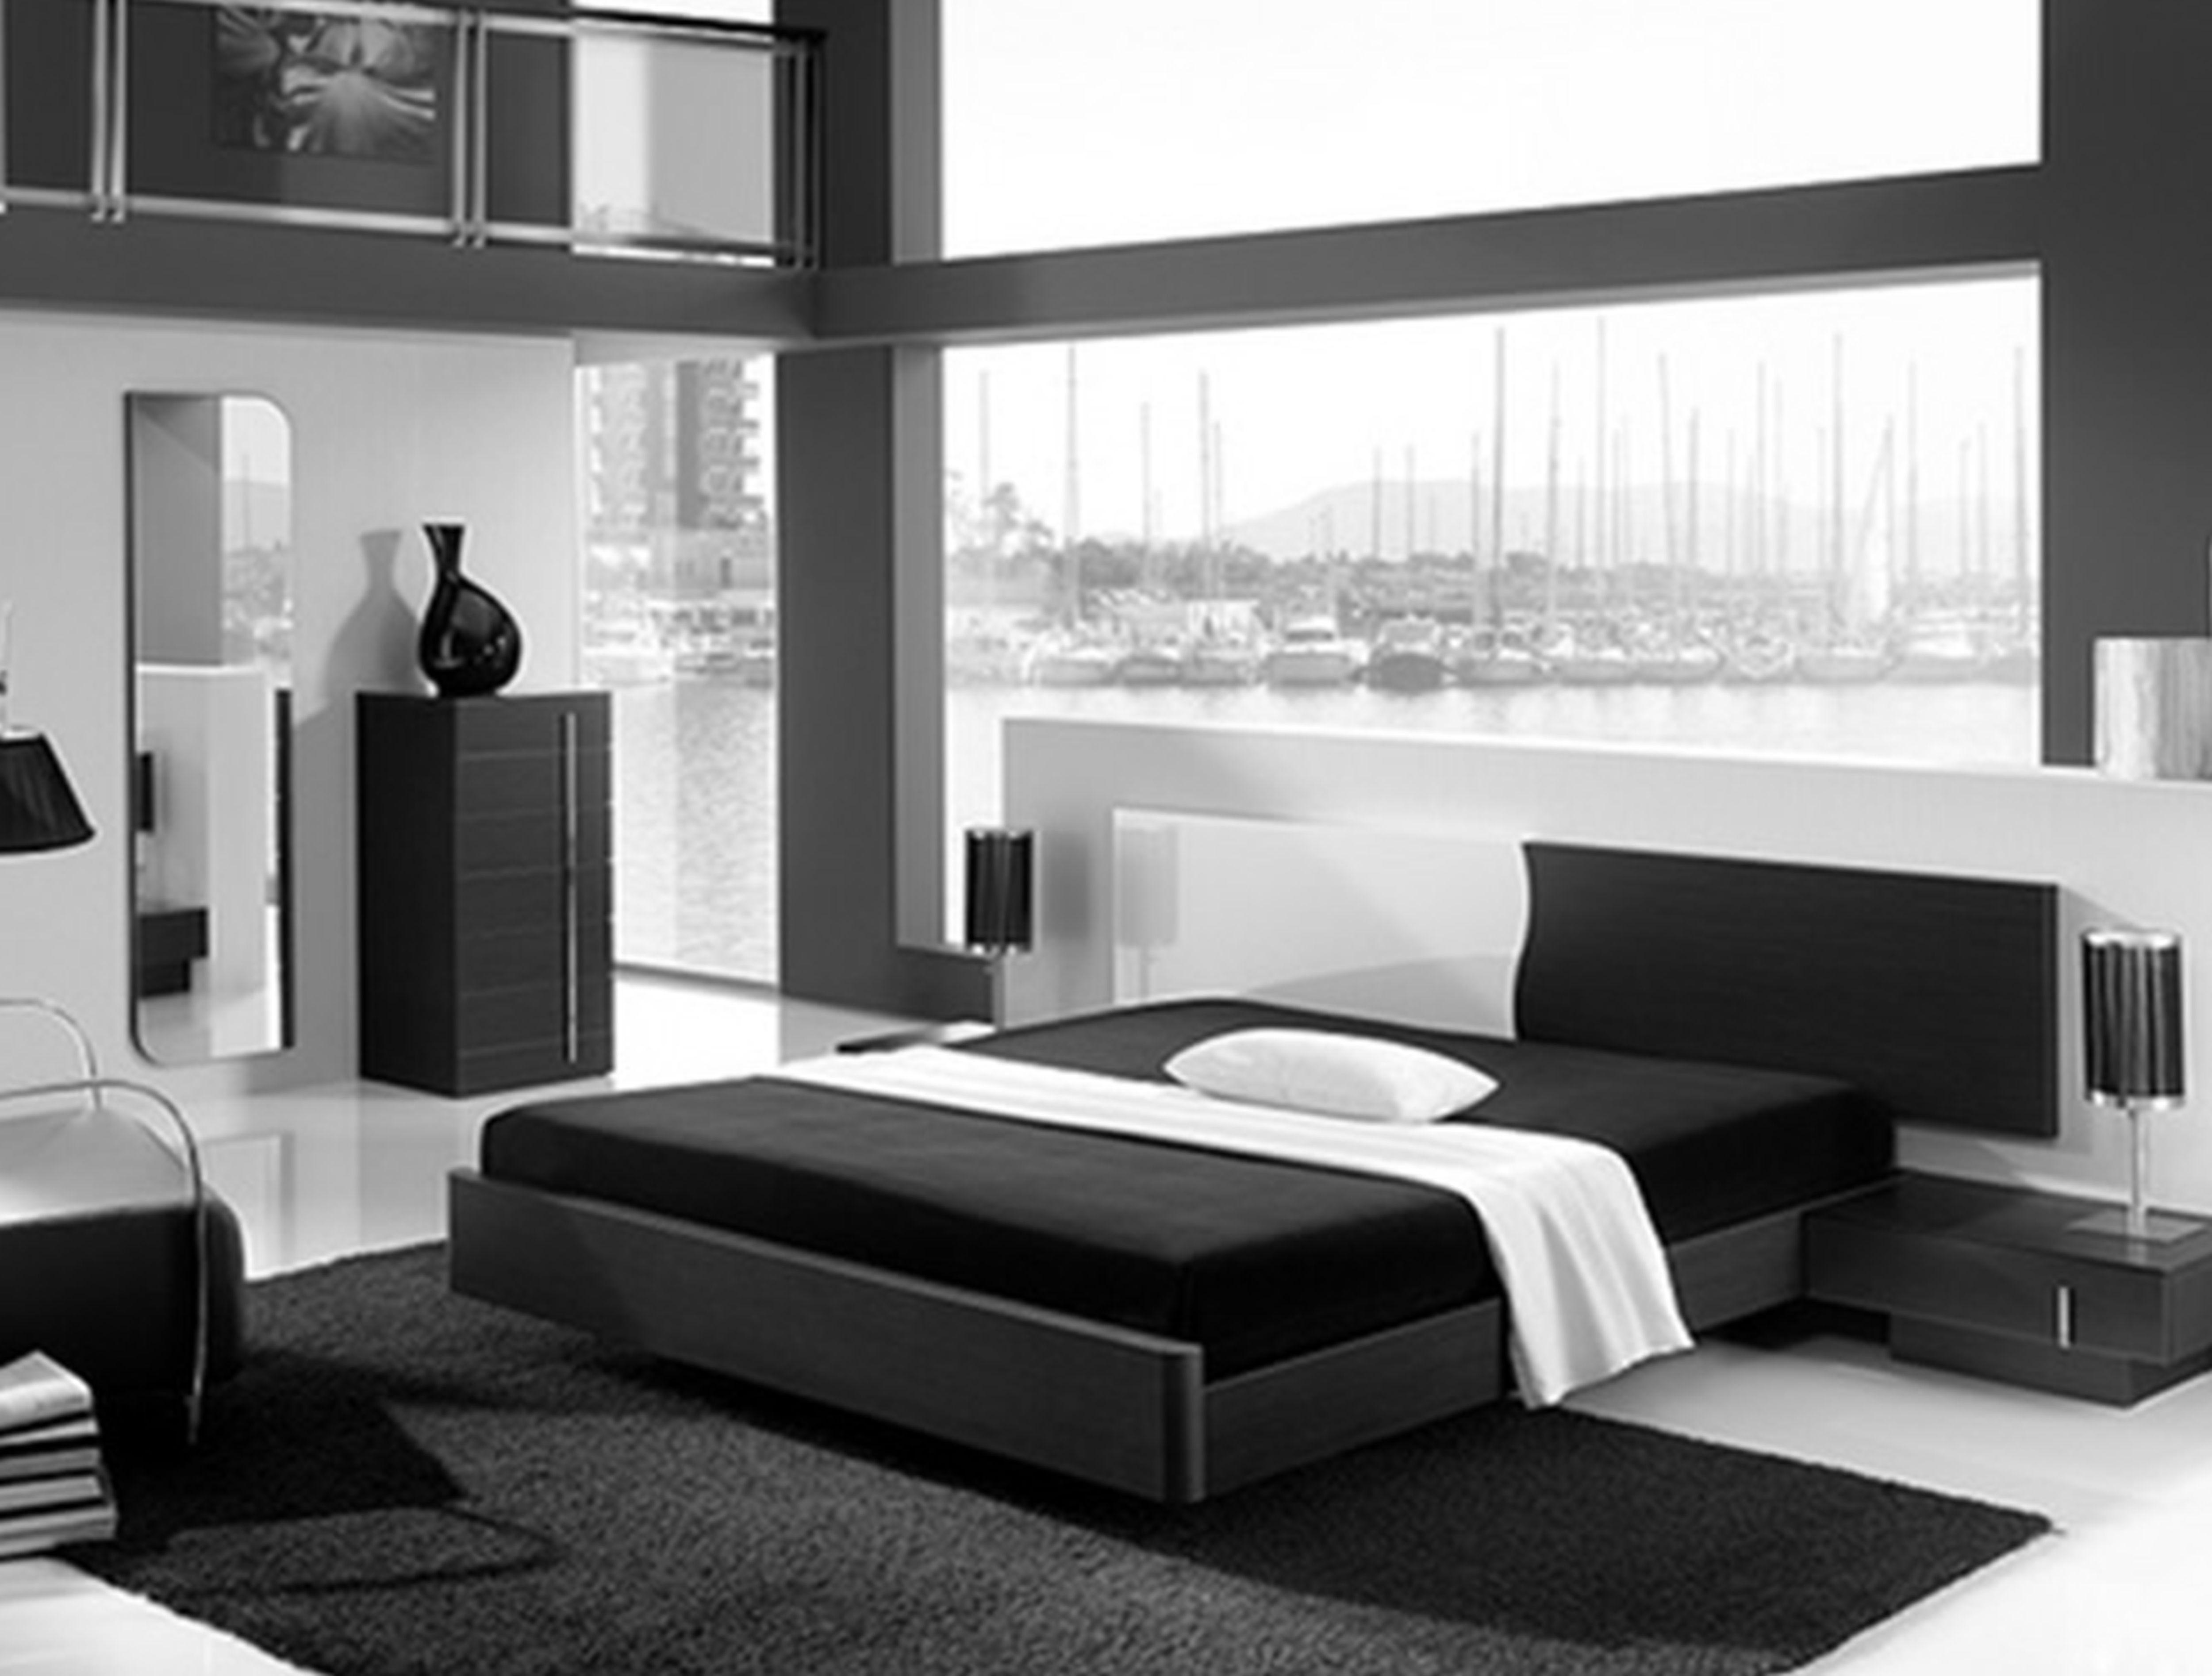 Black And White Modern Bedroom Furniture | Schlafzimmer ...